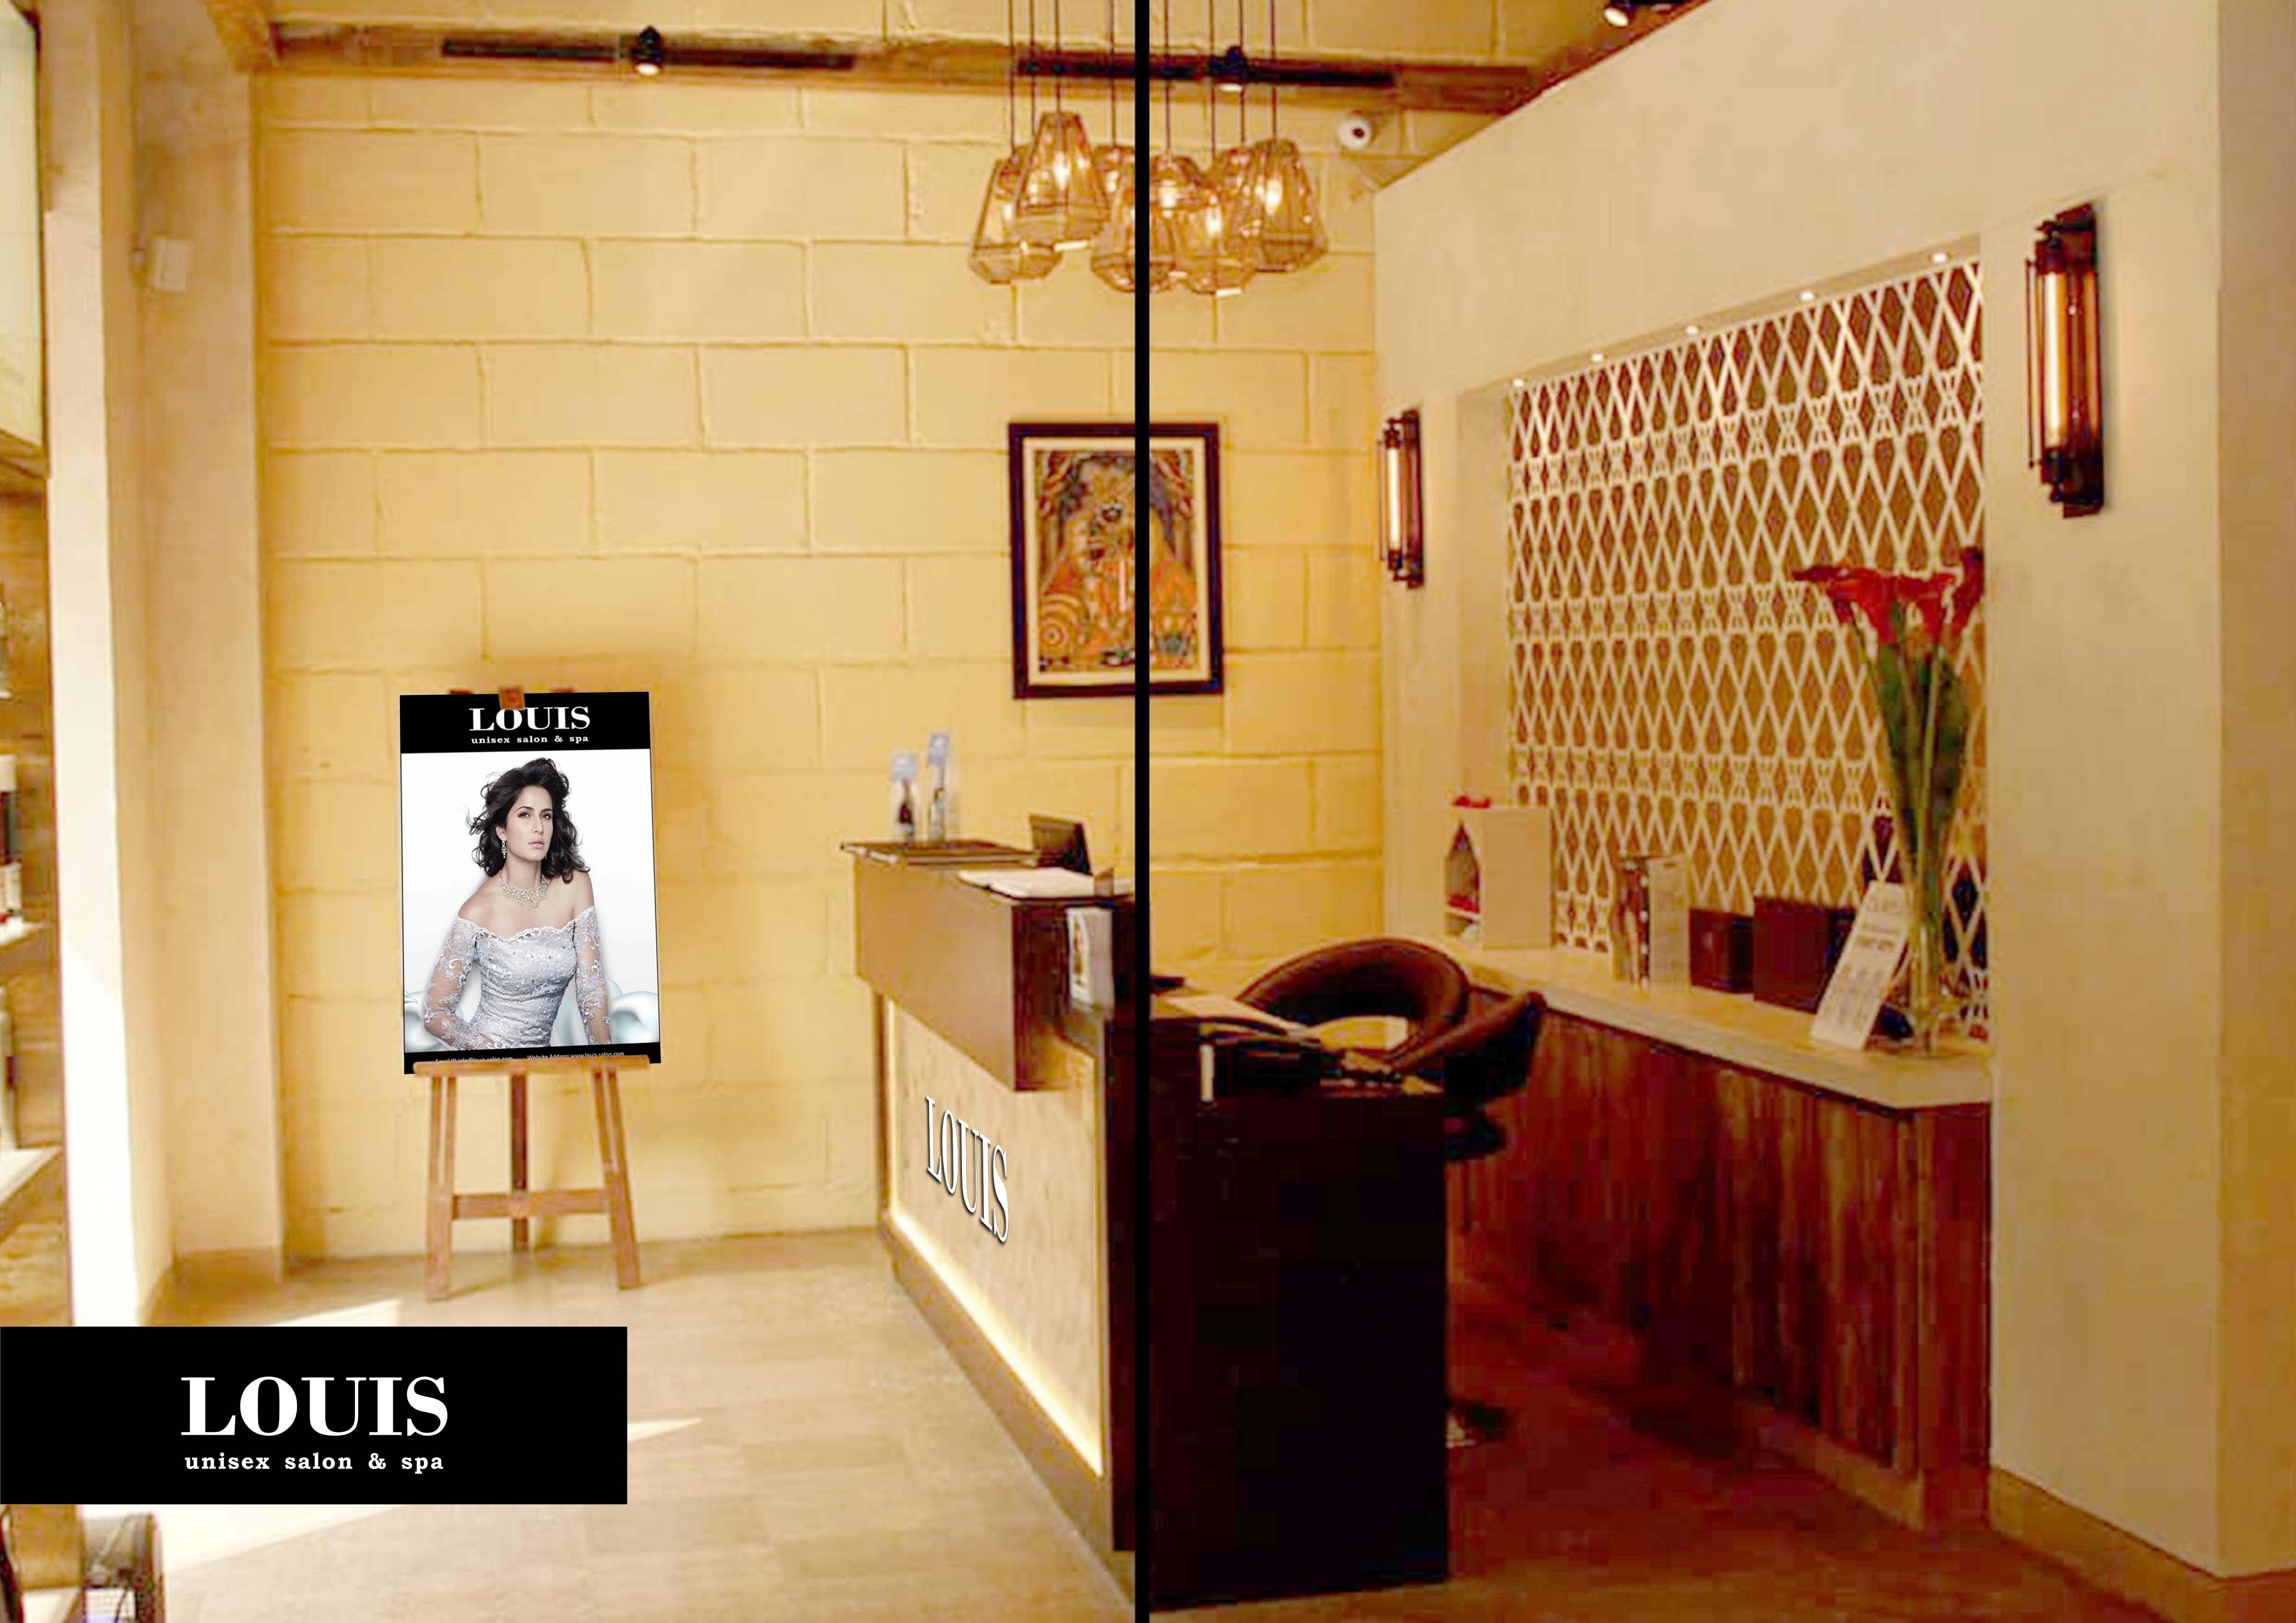 louis+unisex+salon+dubai30 (49)